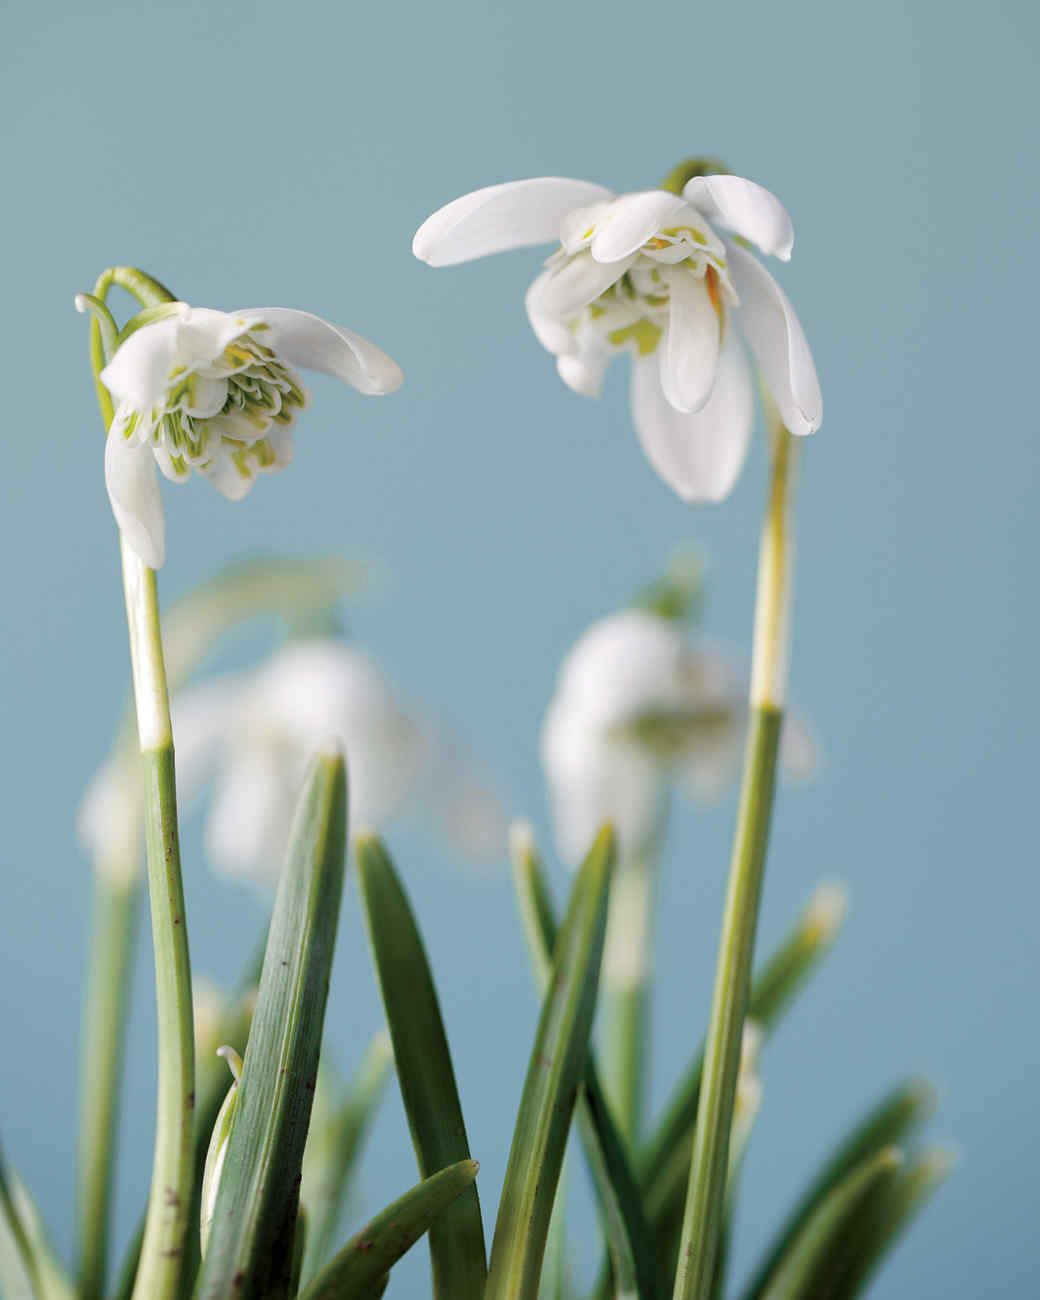 snowdrops-double-petaled-mld107313.jpg